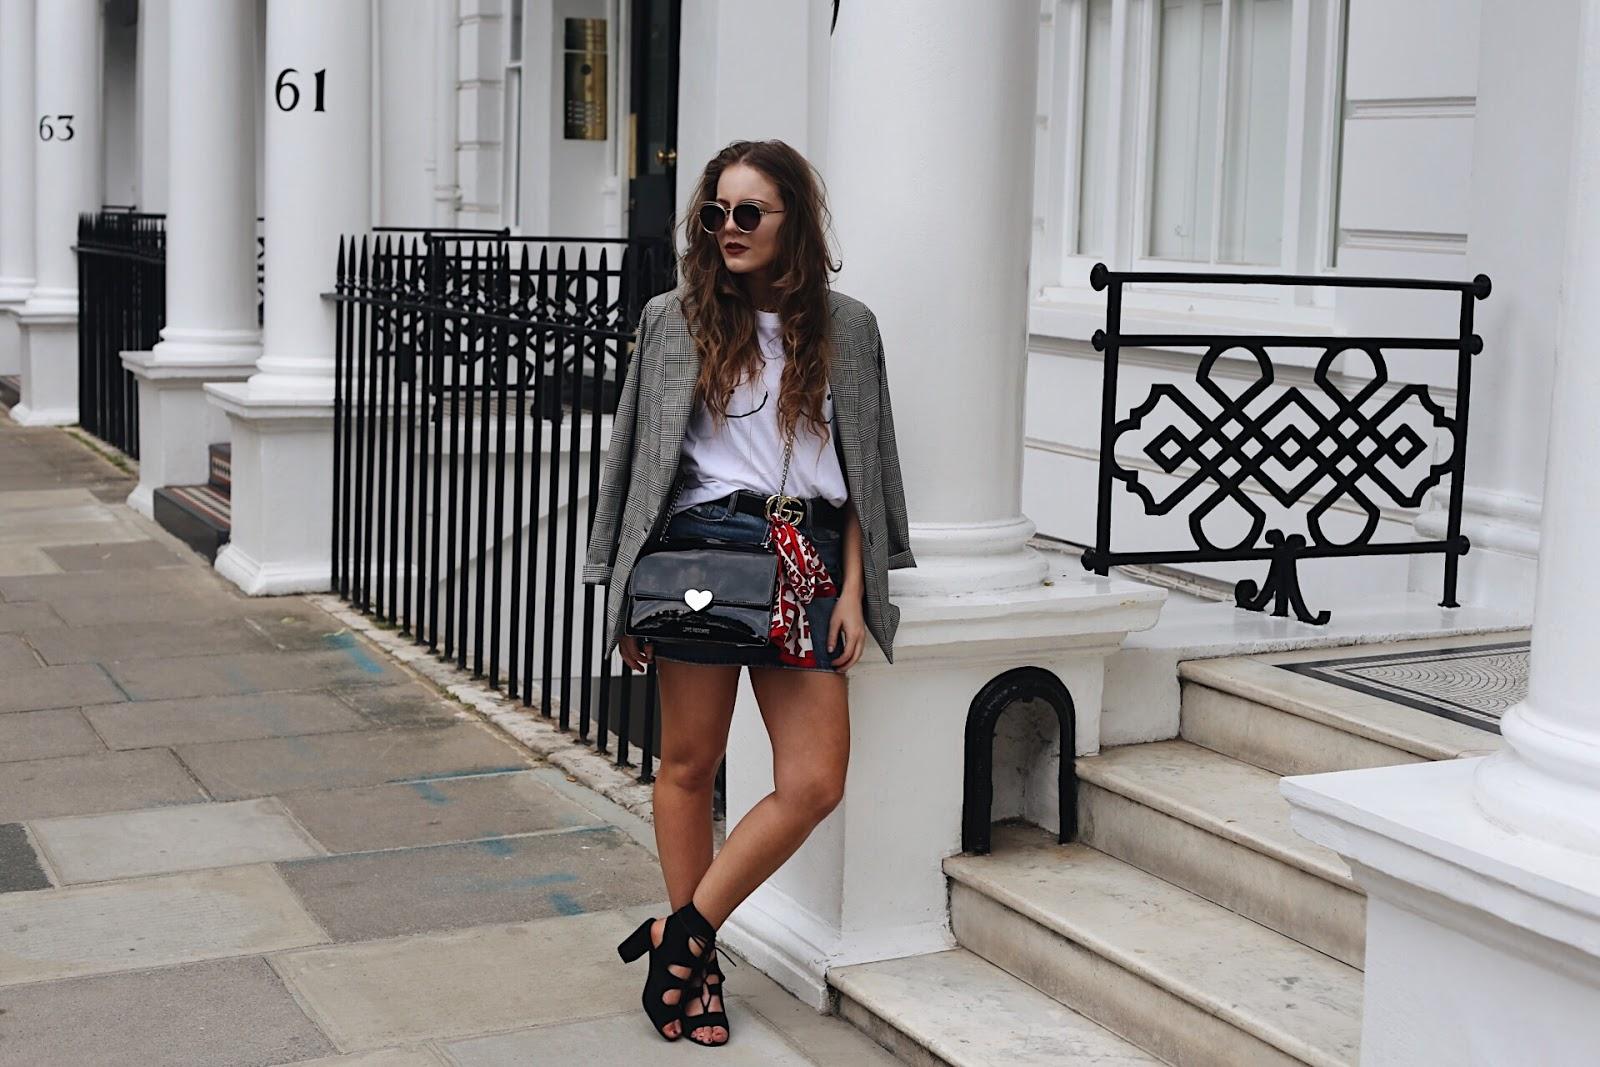 ondon based fashion blogger, london based style blogger, london based petite blogger, london petite style blogger, petite blogger, petite style blogger, london-based fashion blogger, gucci belt, gucci, gucci belt outfit, denim skirt, boohoo denim skirt, denim skirt outfit inspiration, fashion trend 2017, denim skirt must have, boohoo outfit inspo, boohoo denim, gucci belt, gucci, love moschino bag, love moschino, bershka blazer, underboob top, how to blog successfully, blogging tips, how to take blog photos, blogging 101, tips for blogging